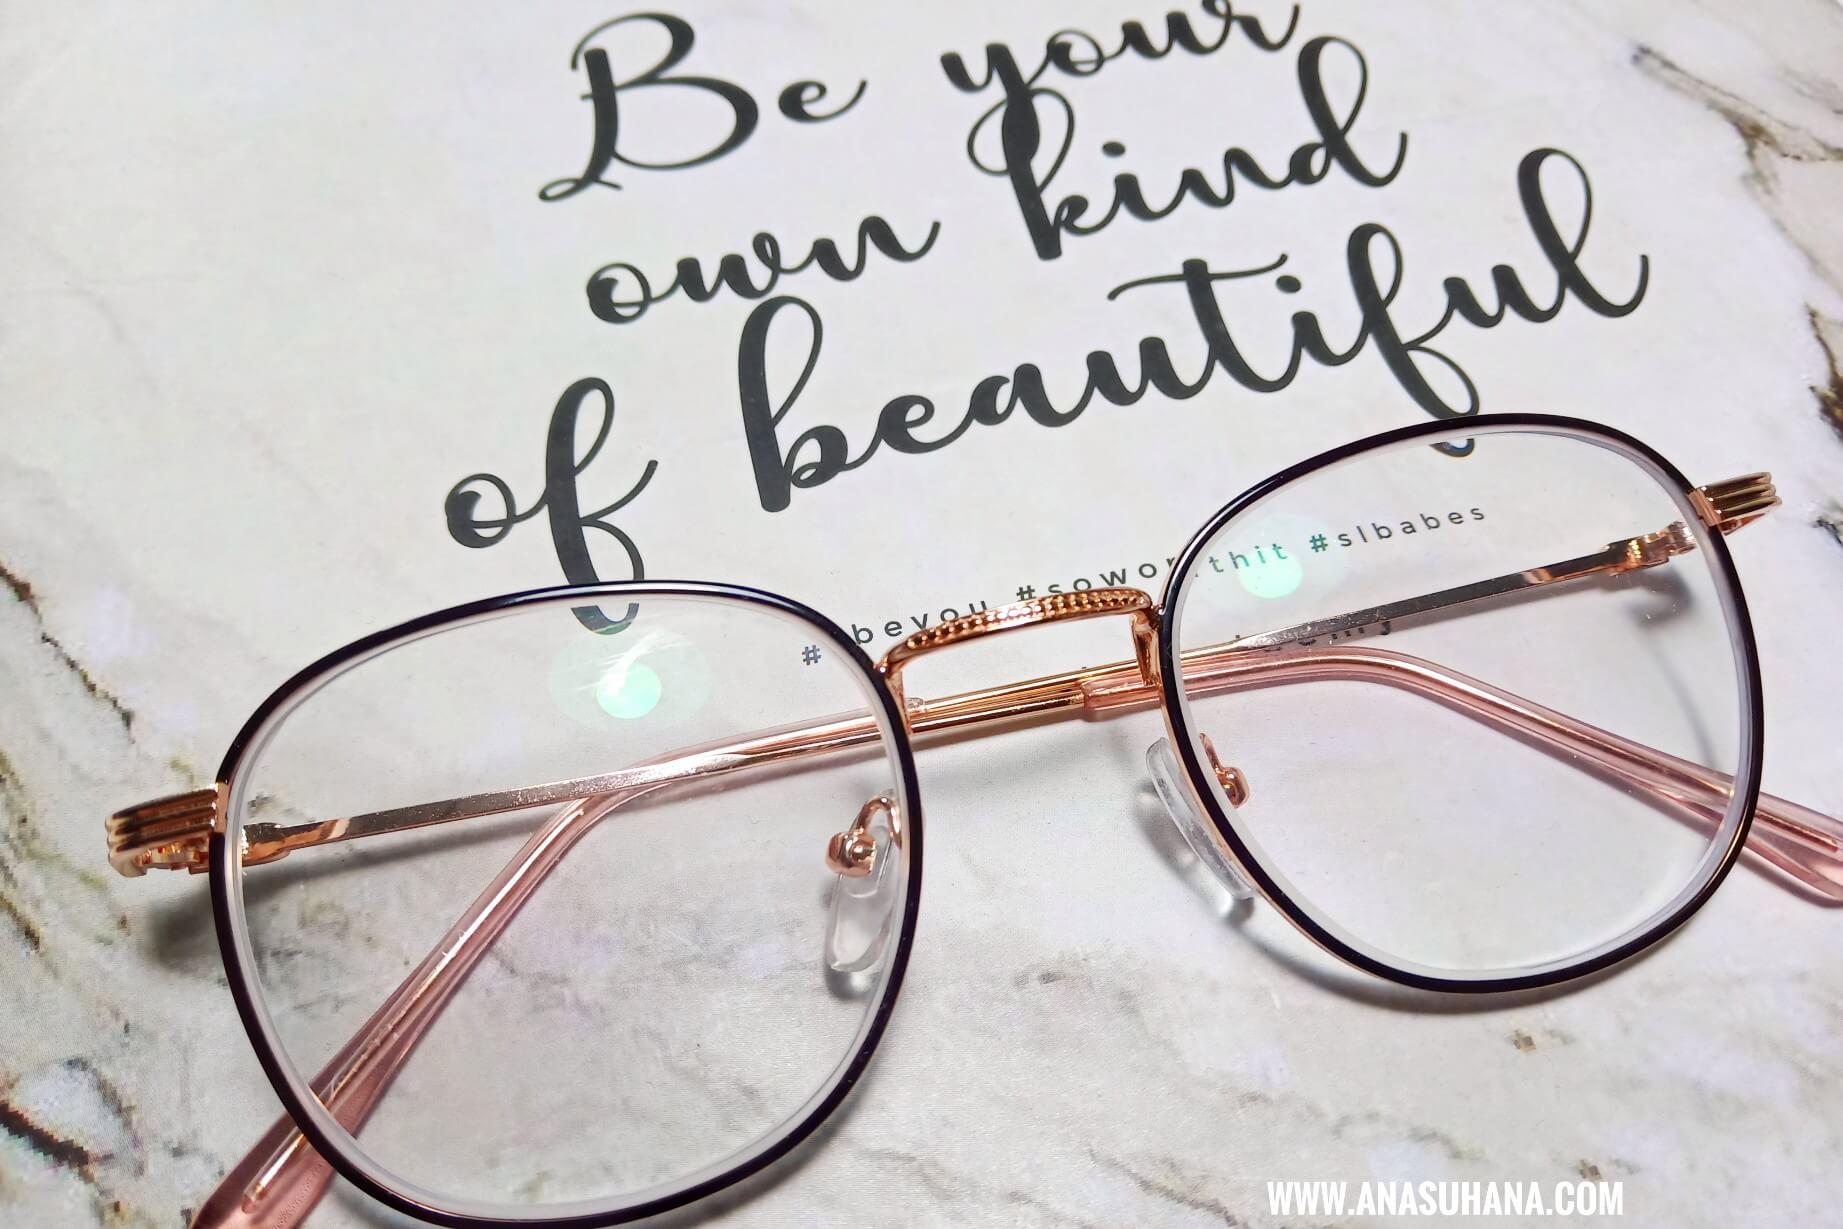 Cermin Mata Murah Dengan Alpha Blue 420 Lens di Eye Pro Vision. Patutlah Jadi Kedai Spek Viral di Malaysia!!